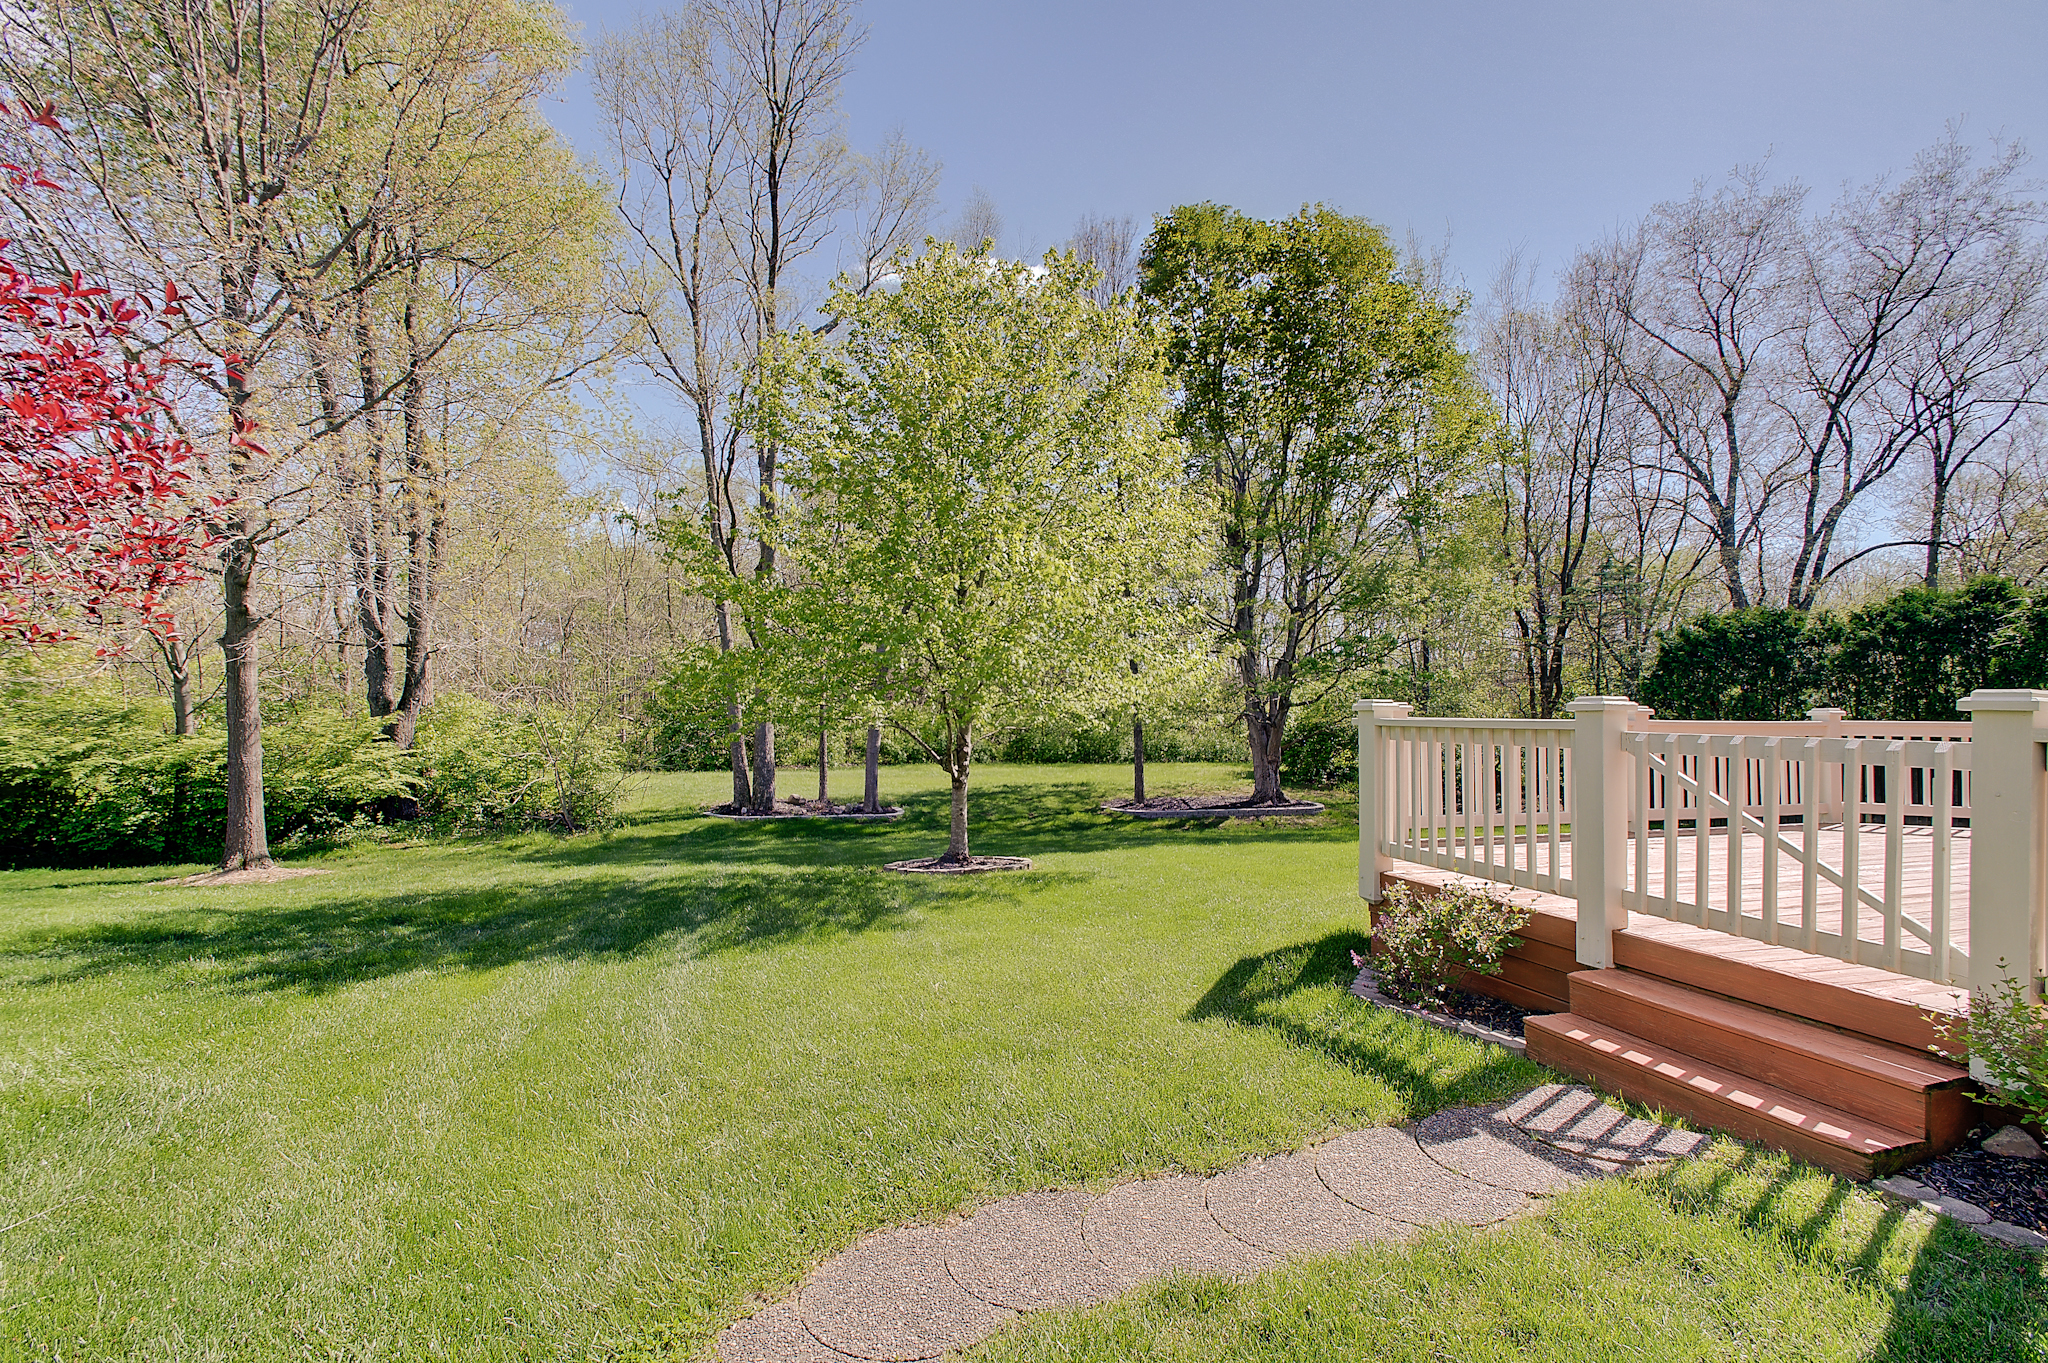 37-Rear-Yard-View-2.jpg